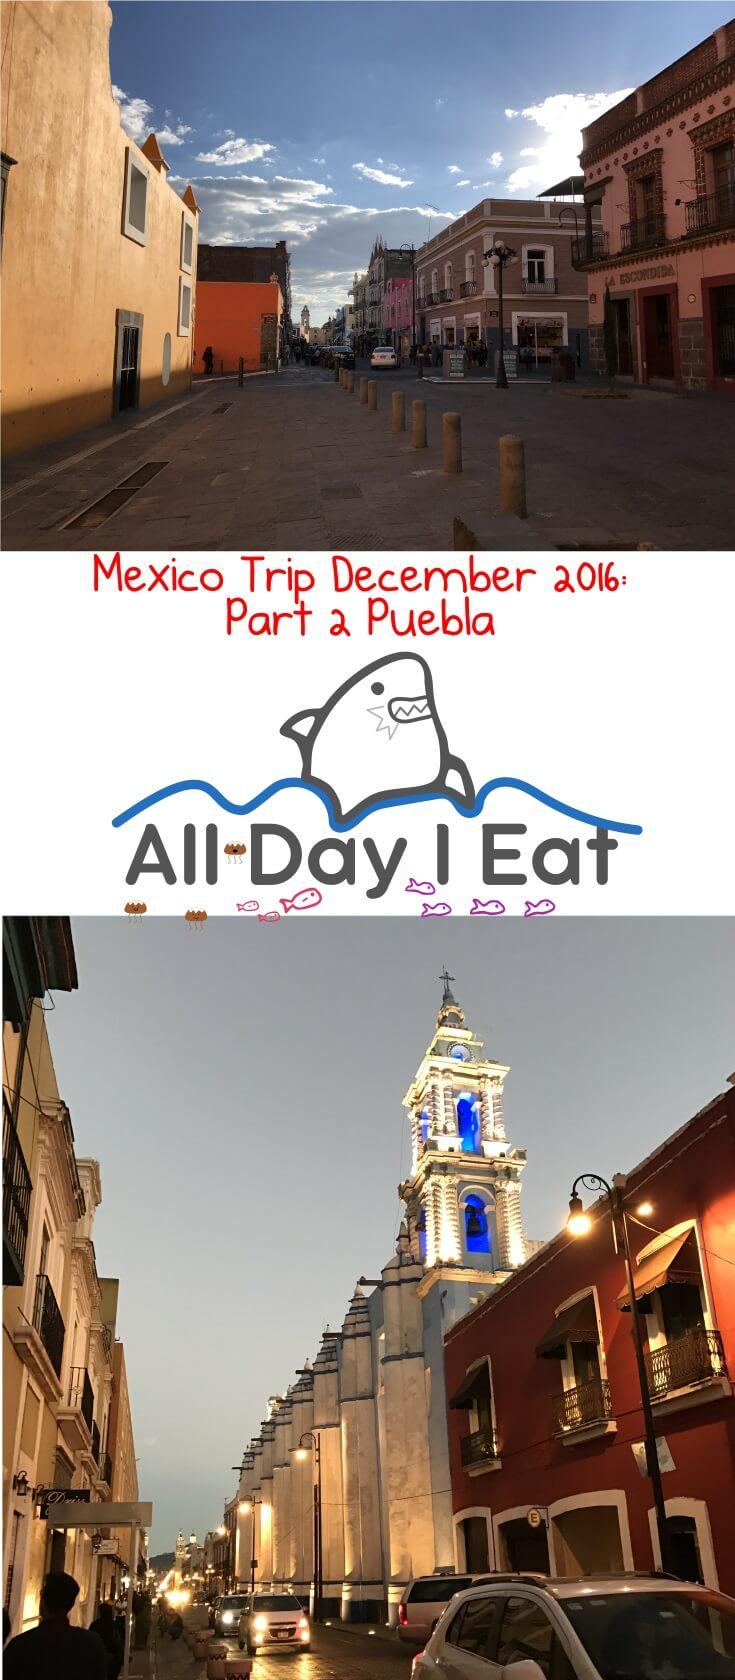 Mexico Trip December 2016: Part 2 Puebla | www.alldayieat.com